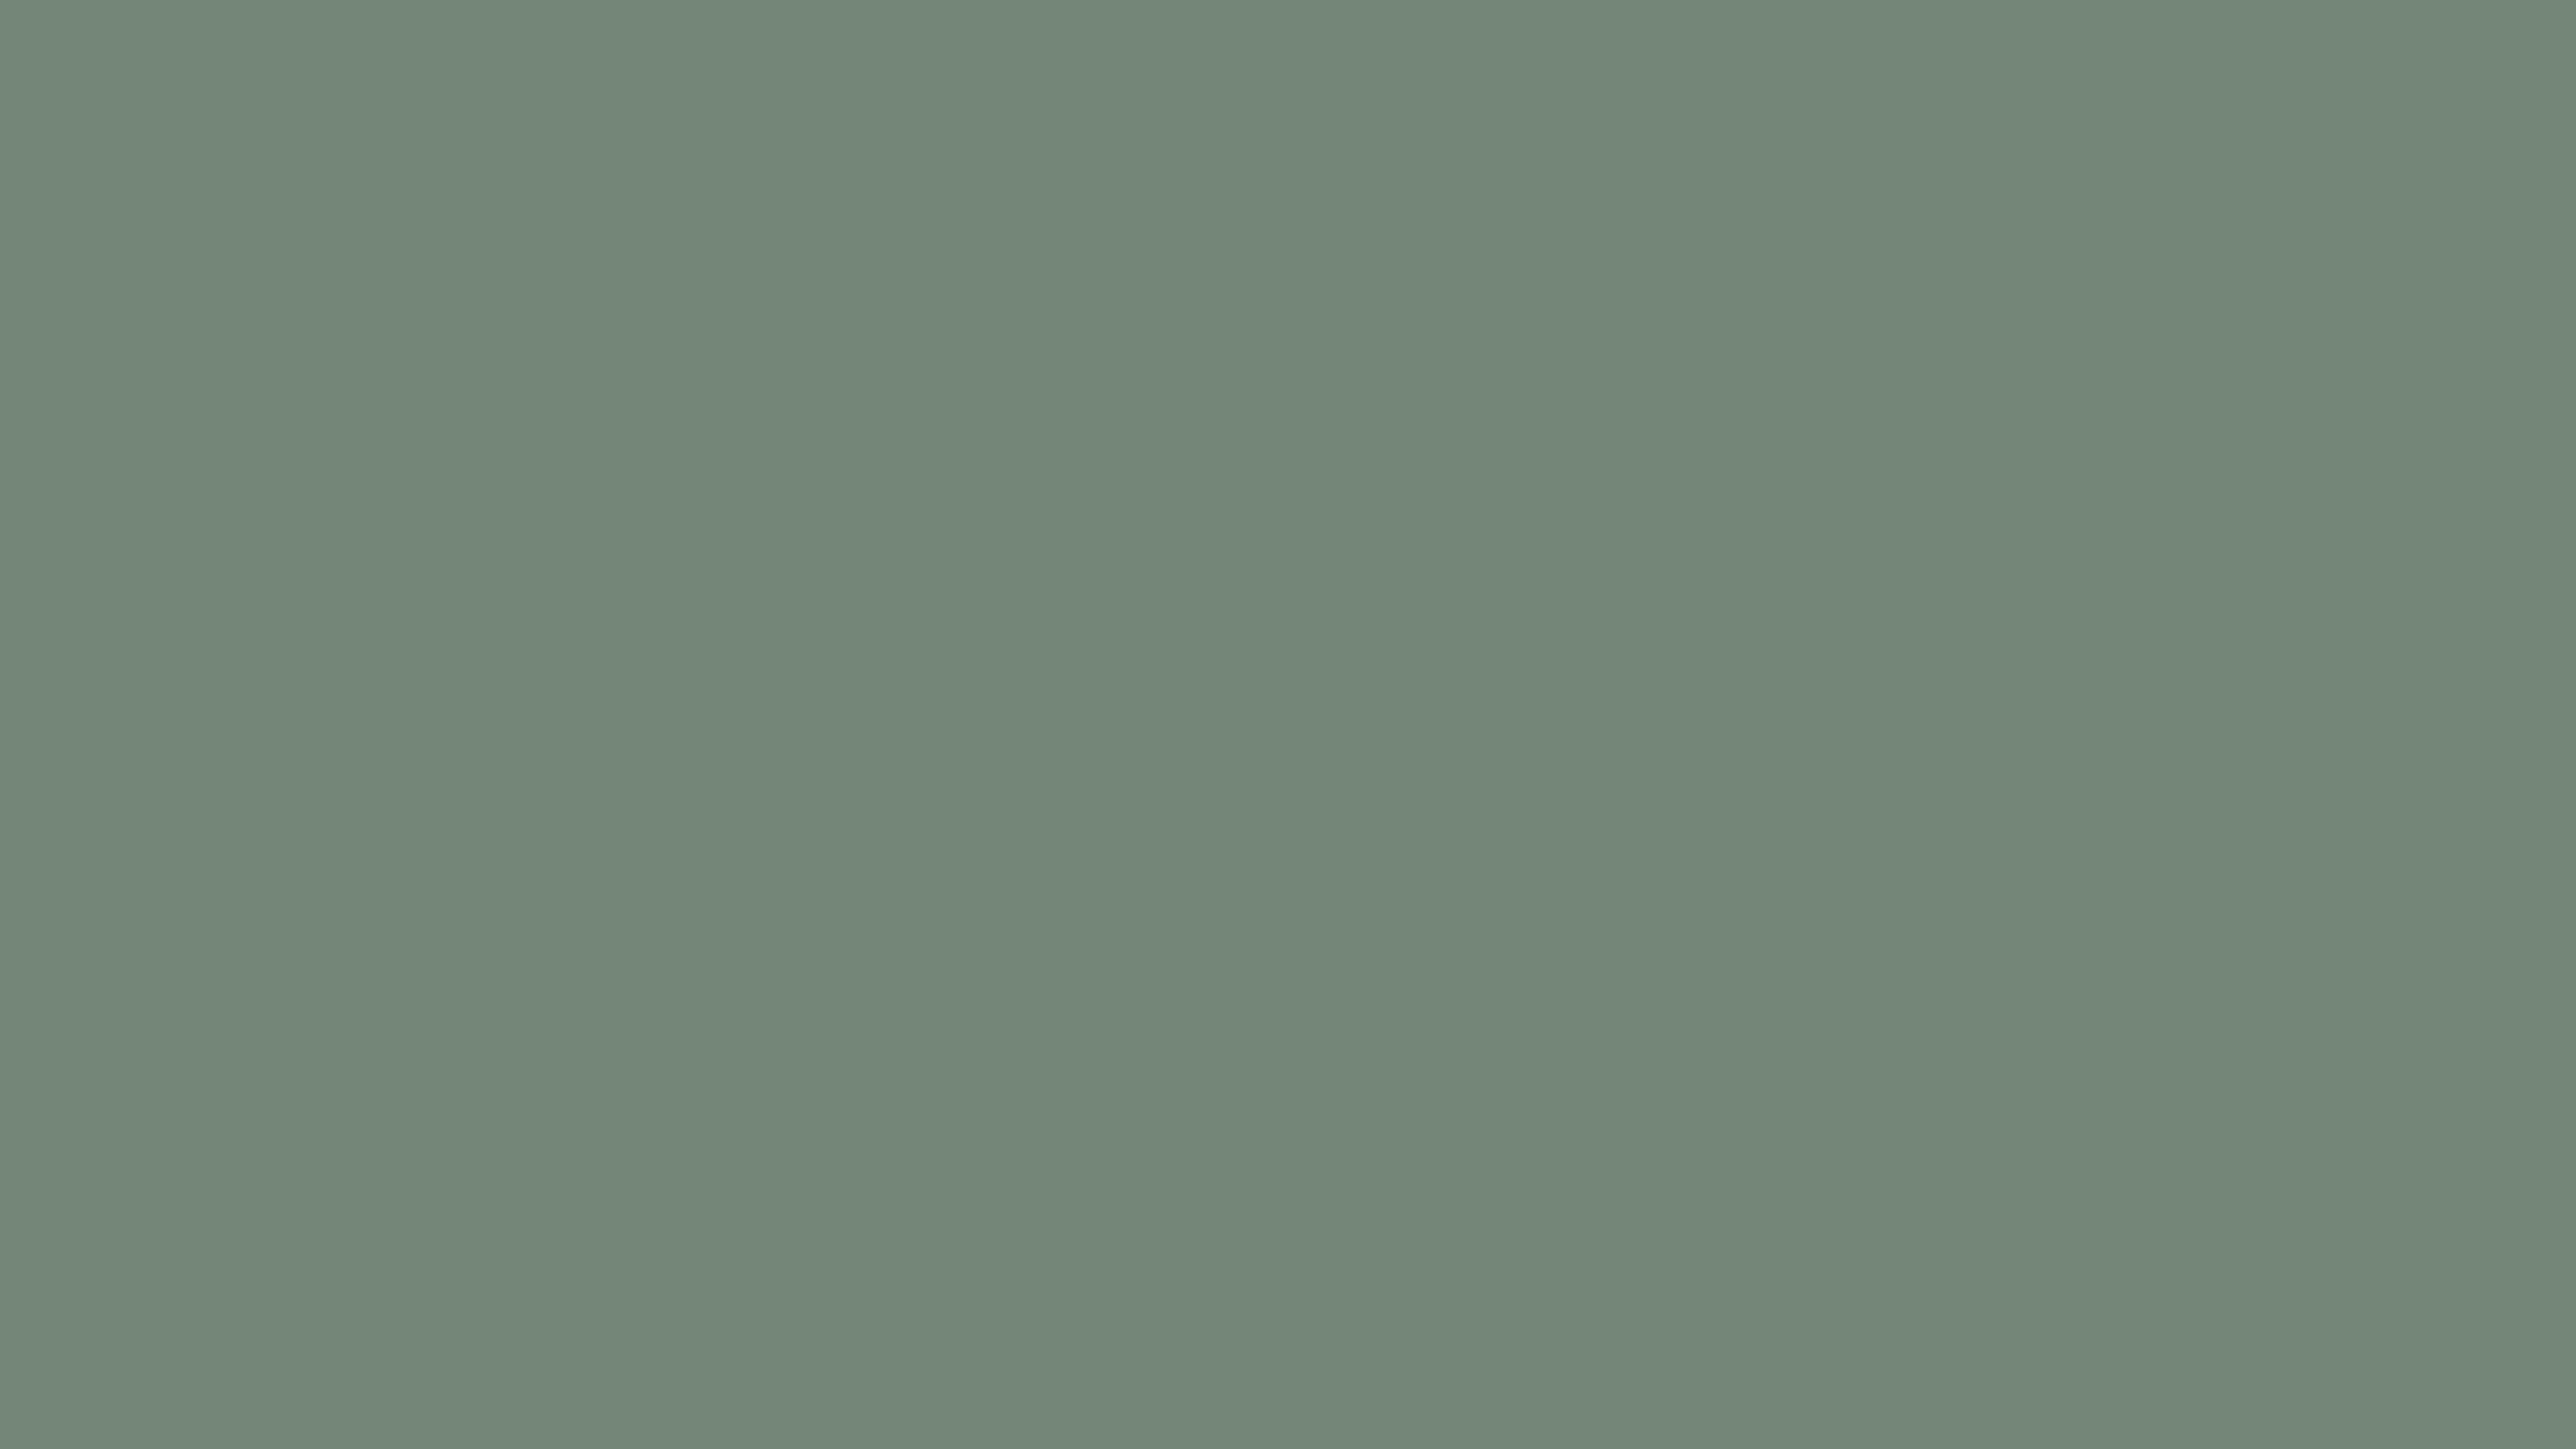 4096x2304 Xanadu Solid Color Background